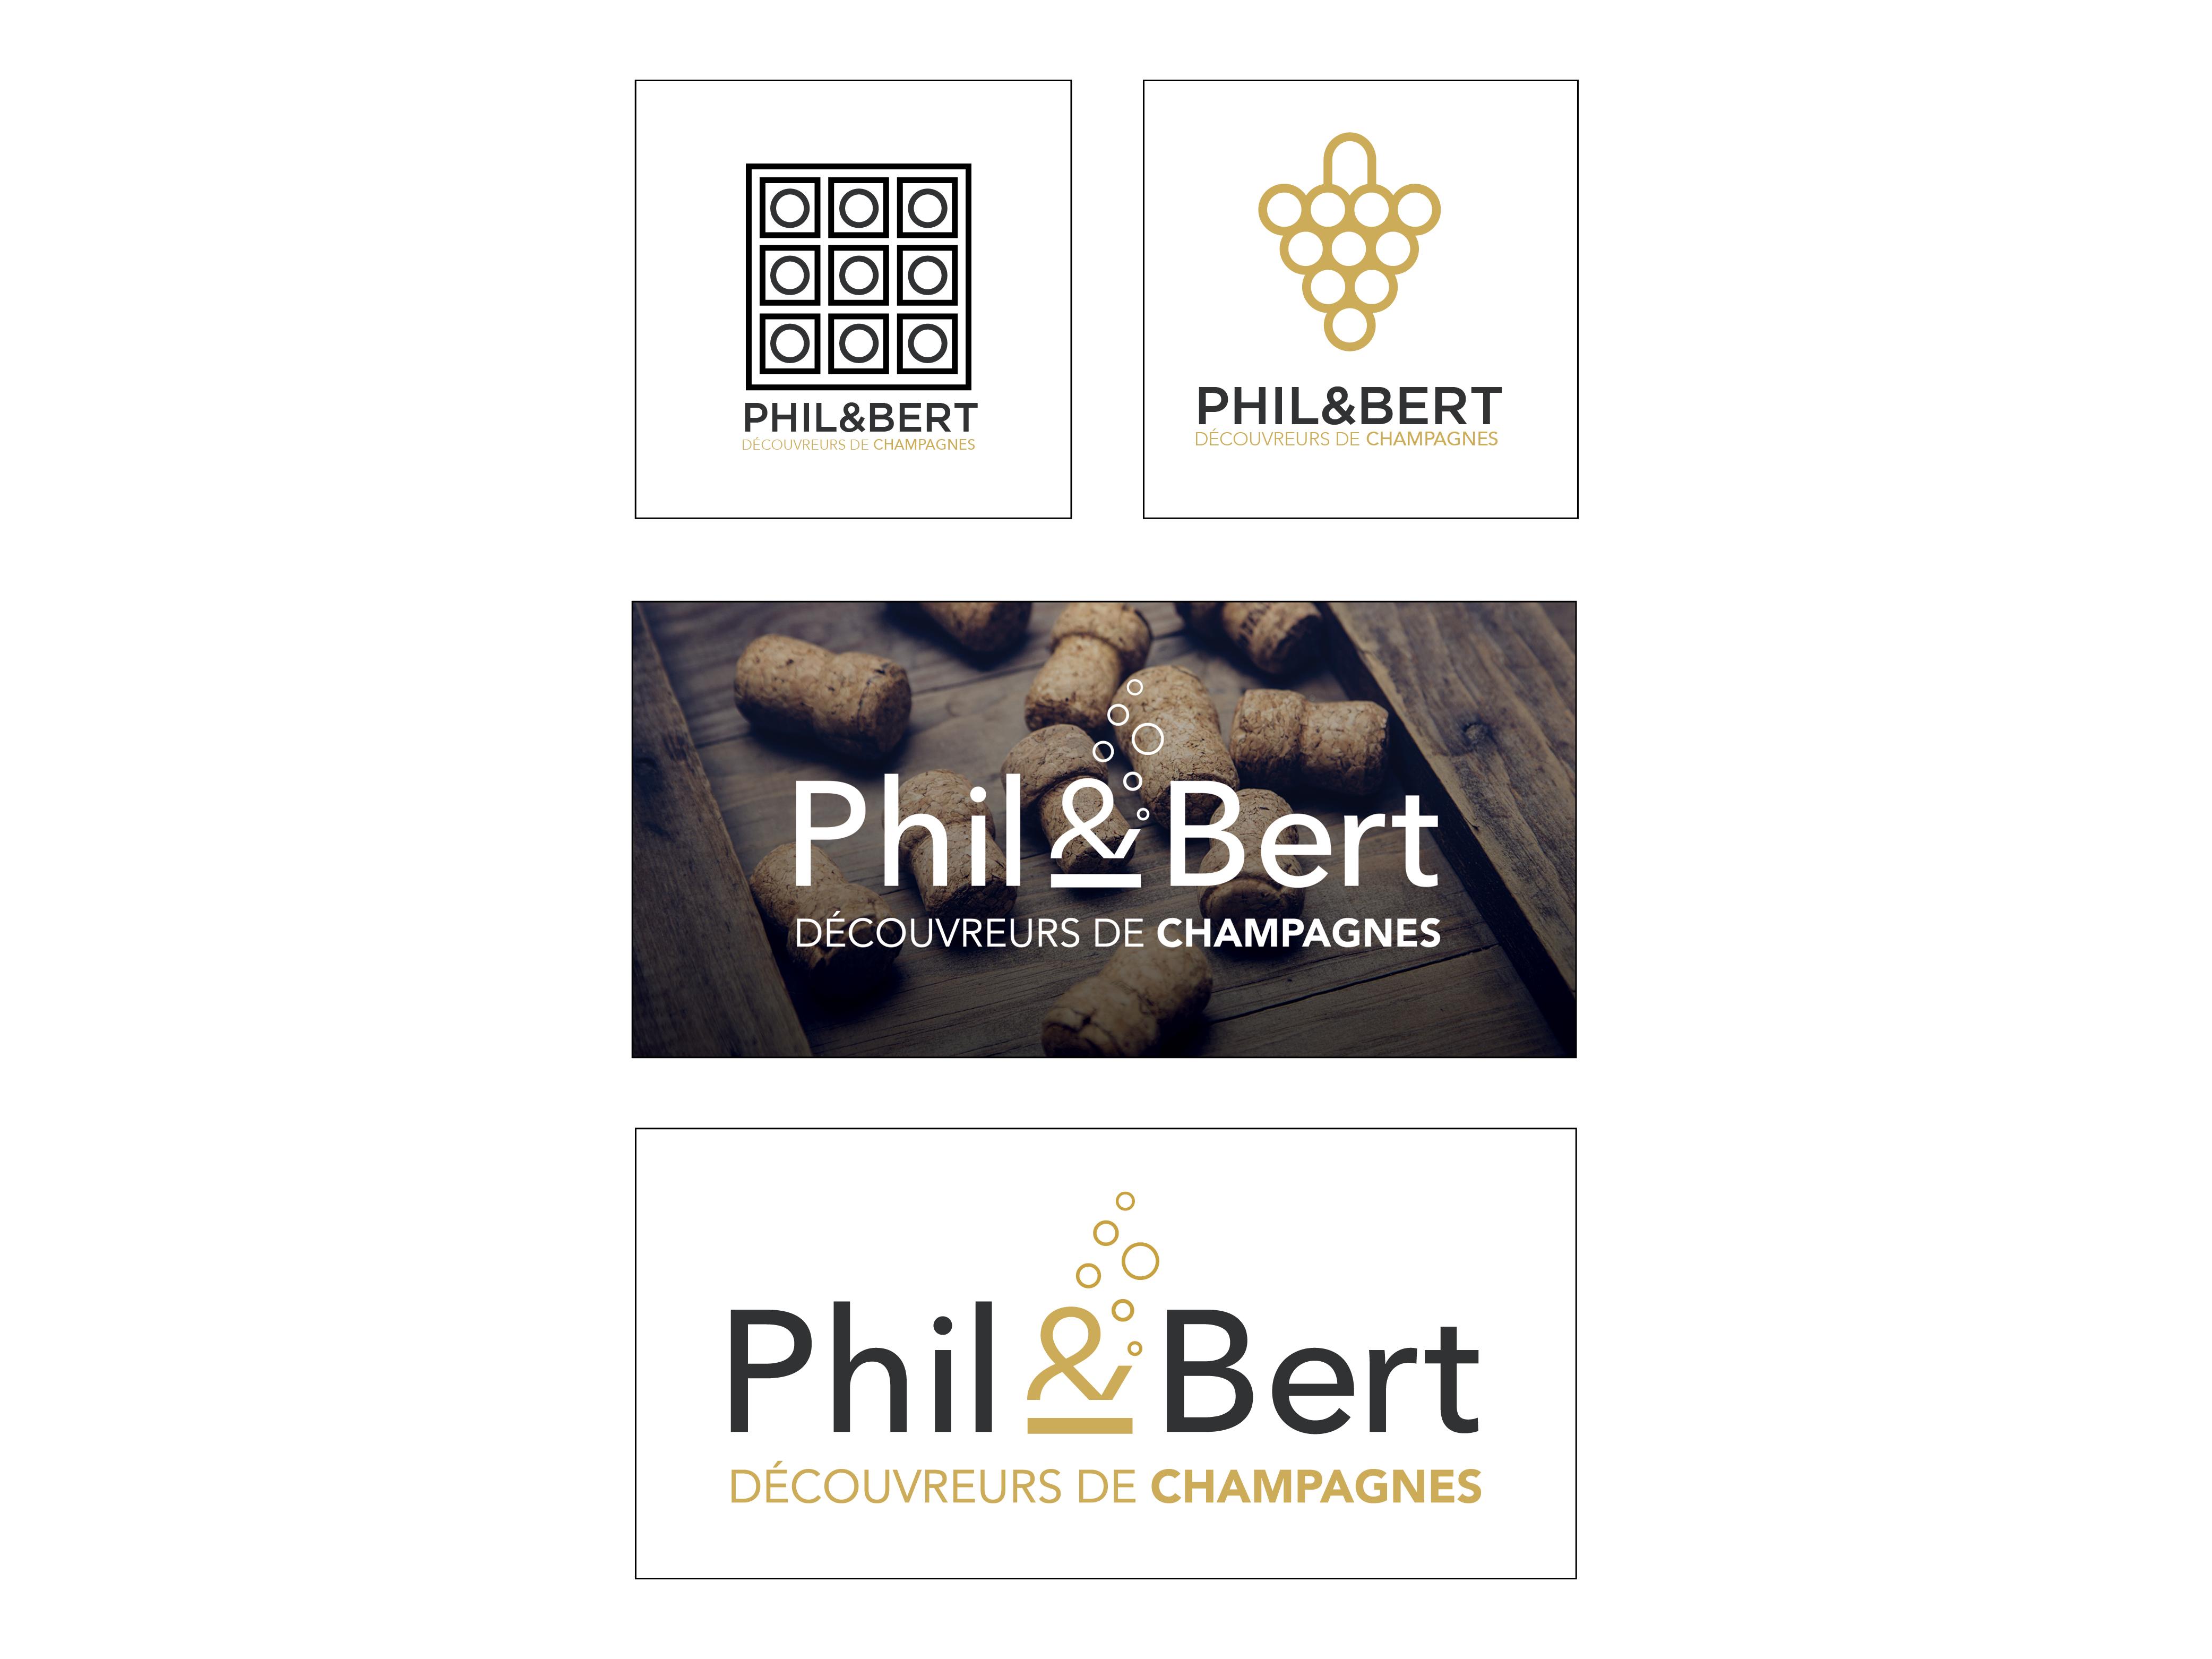 LetortCharlotte_Phil&Bert_1